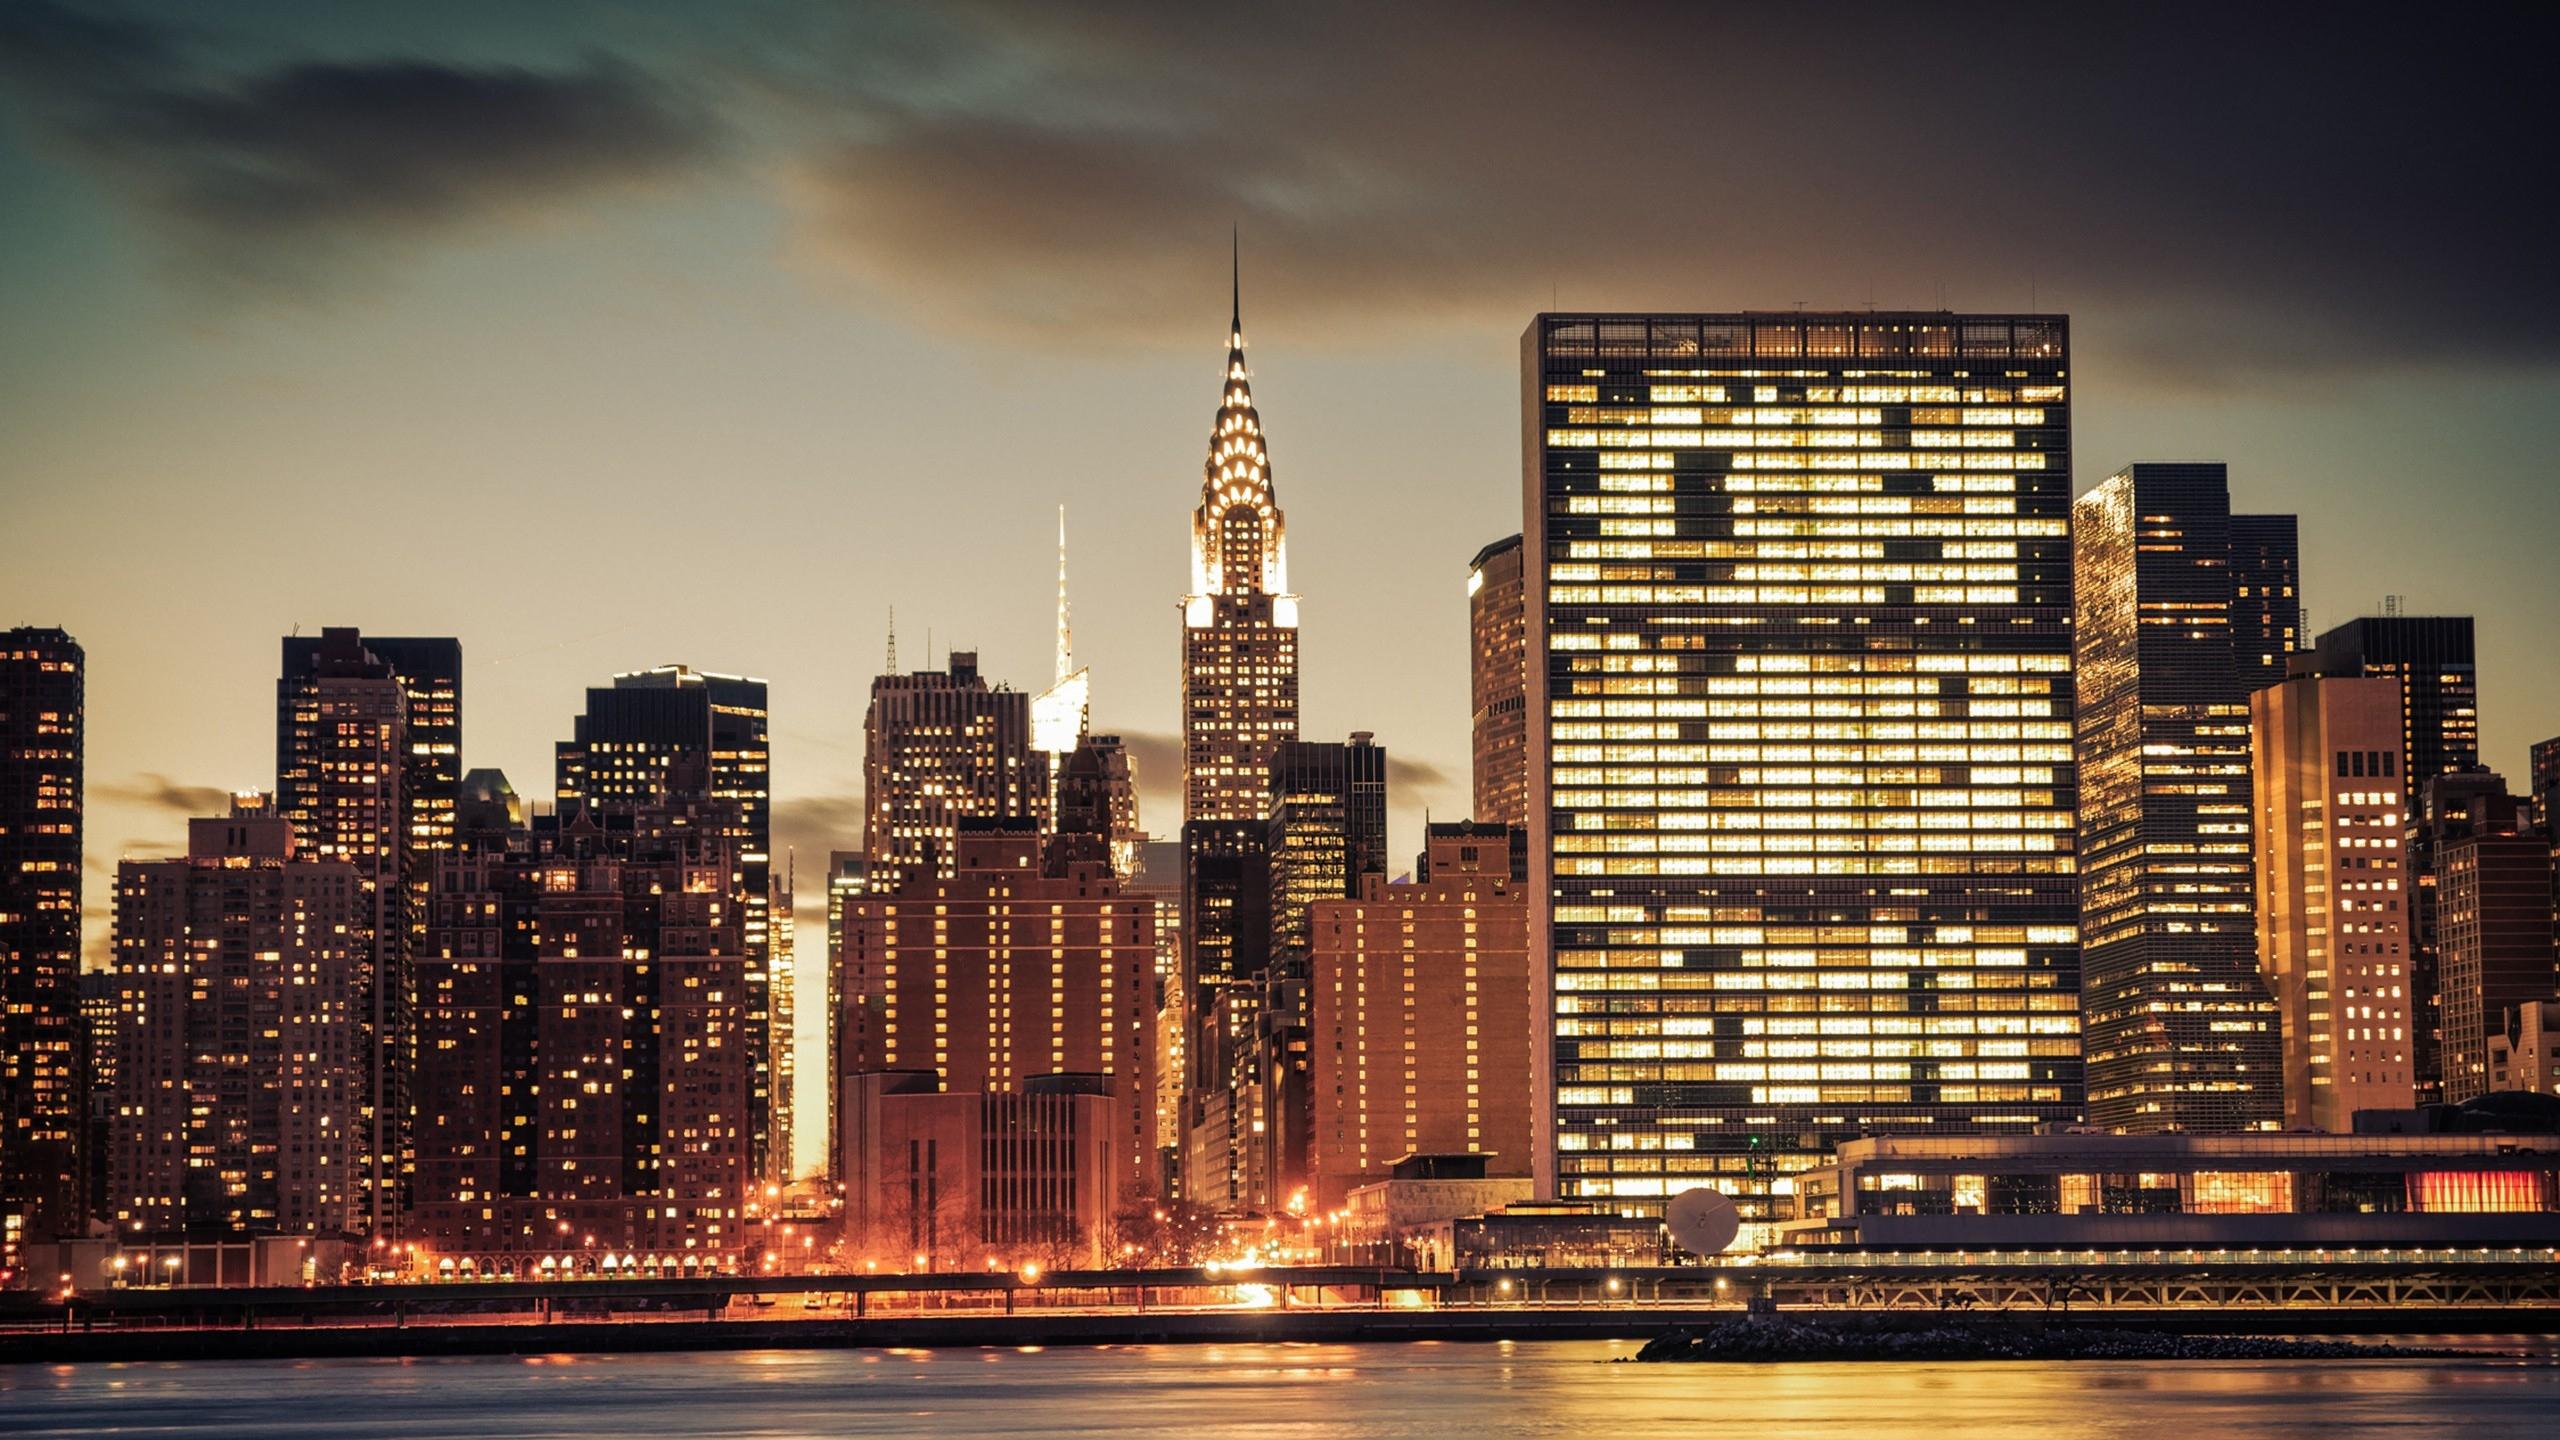 Download Wallpaper 2560x1440 City Skyline River Mac Imac 27 Hd Cliparts Co